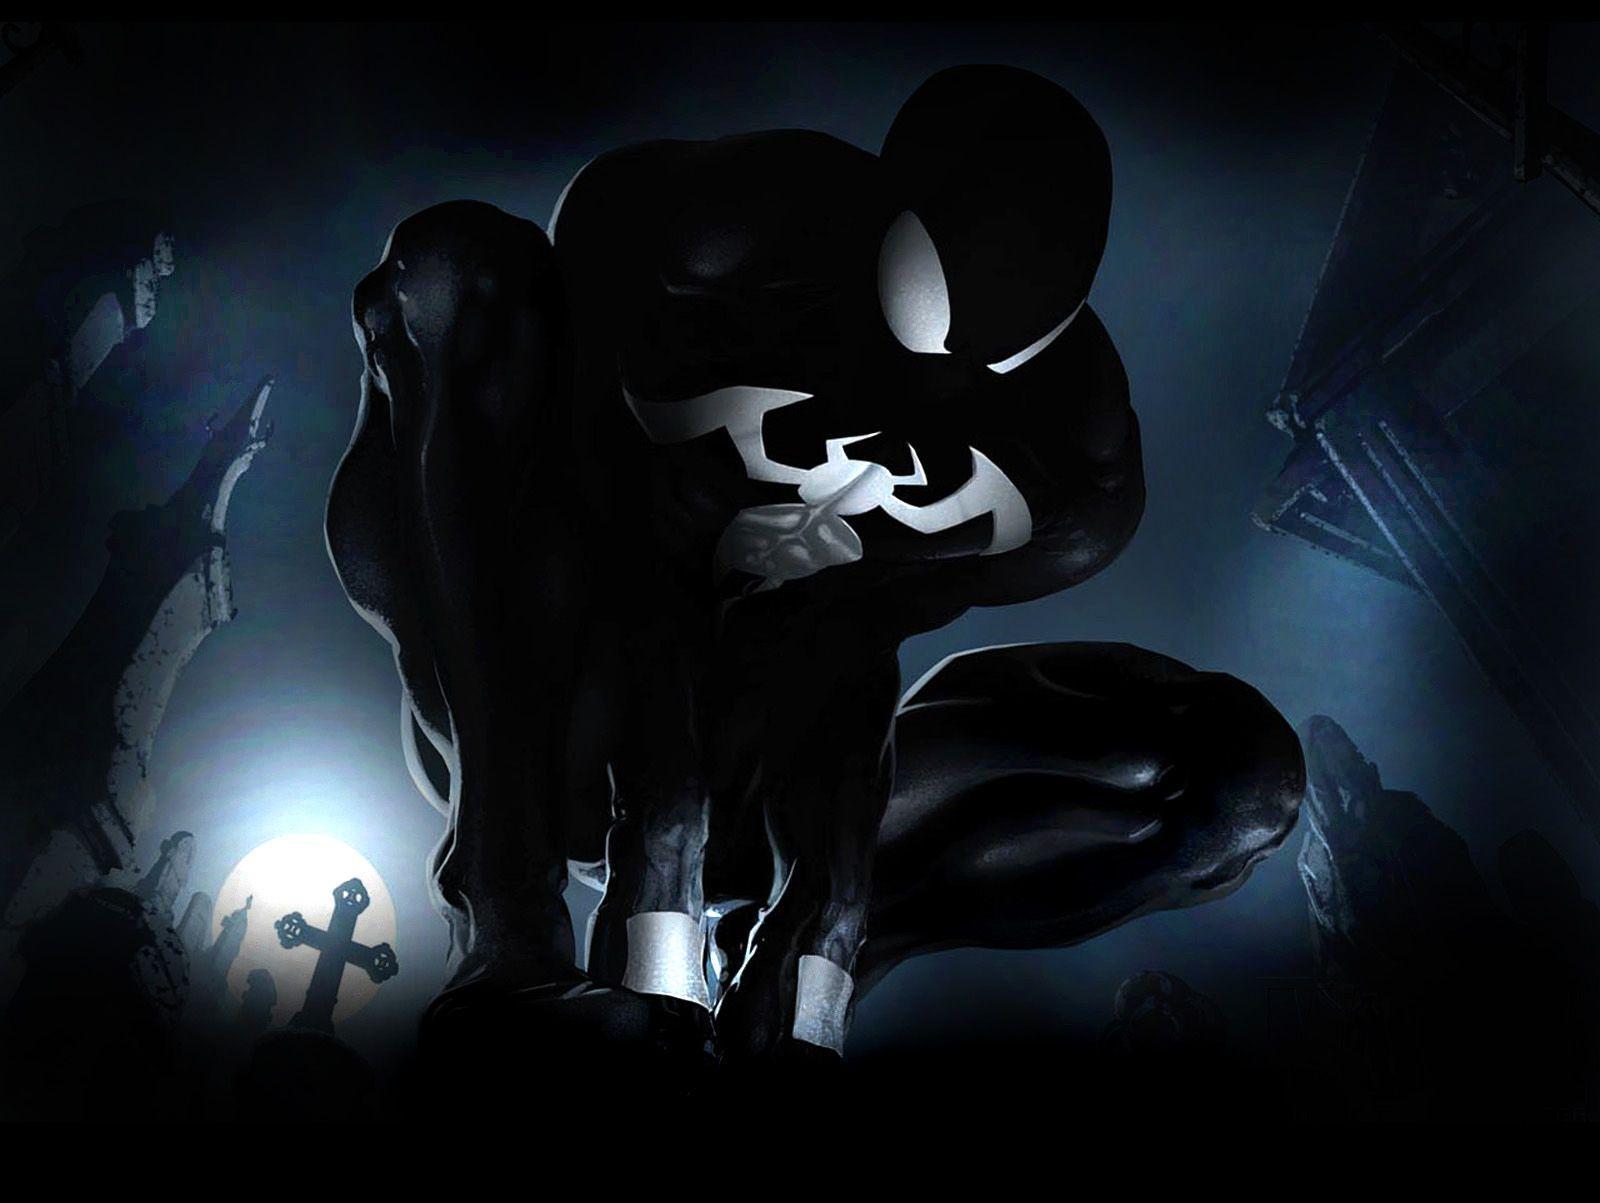 Marvel Venom Wallpapers - Top Free Marvel Venom Backgrounds